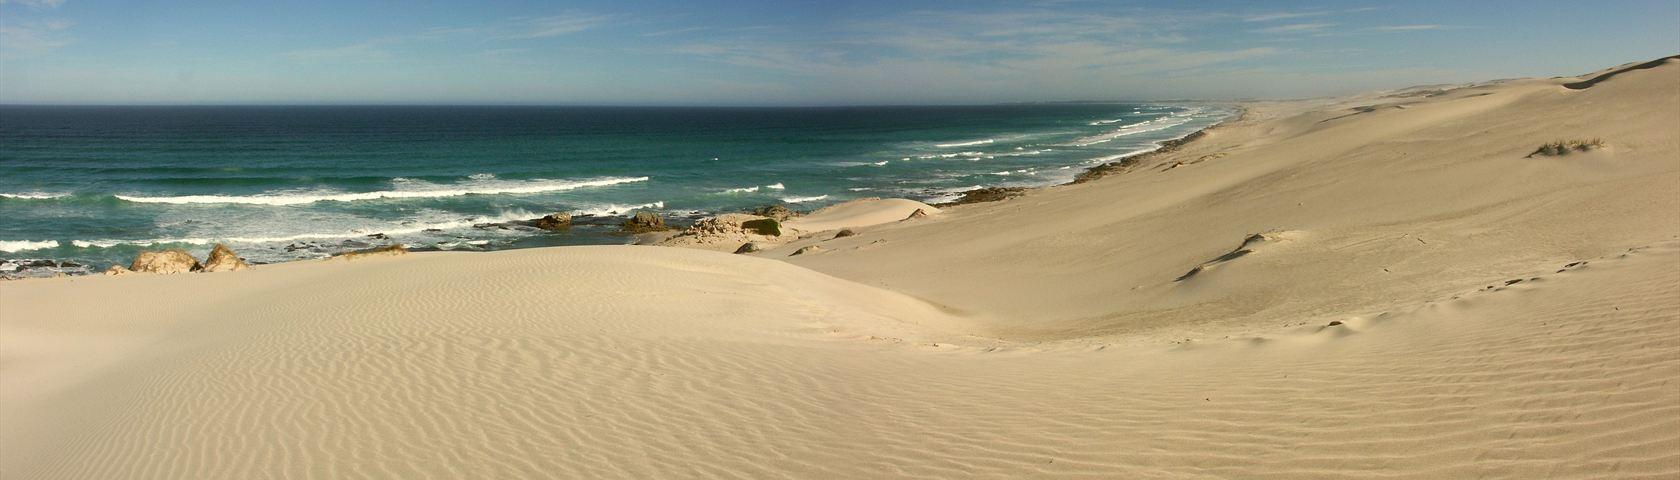 Dune Coast